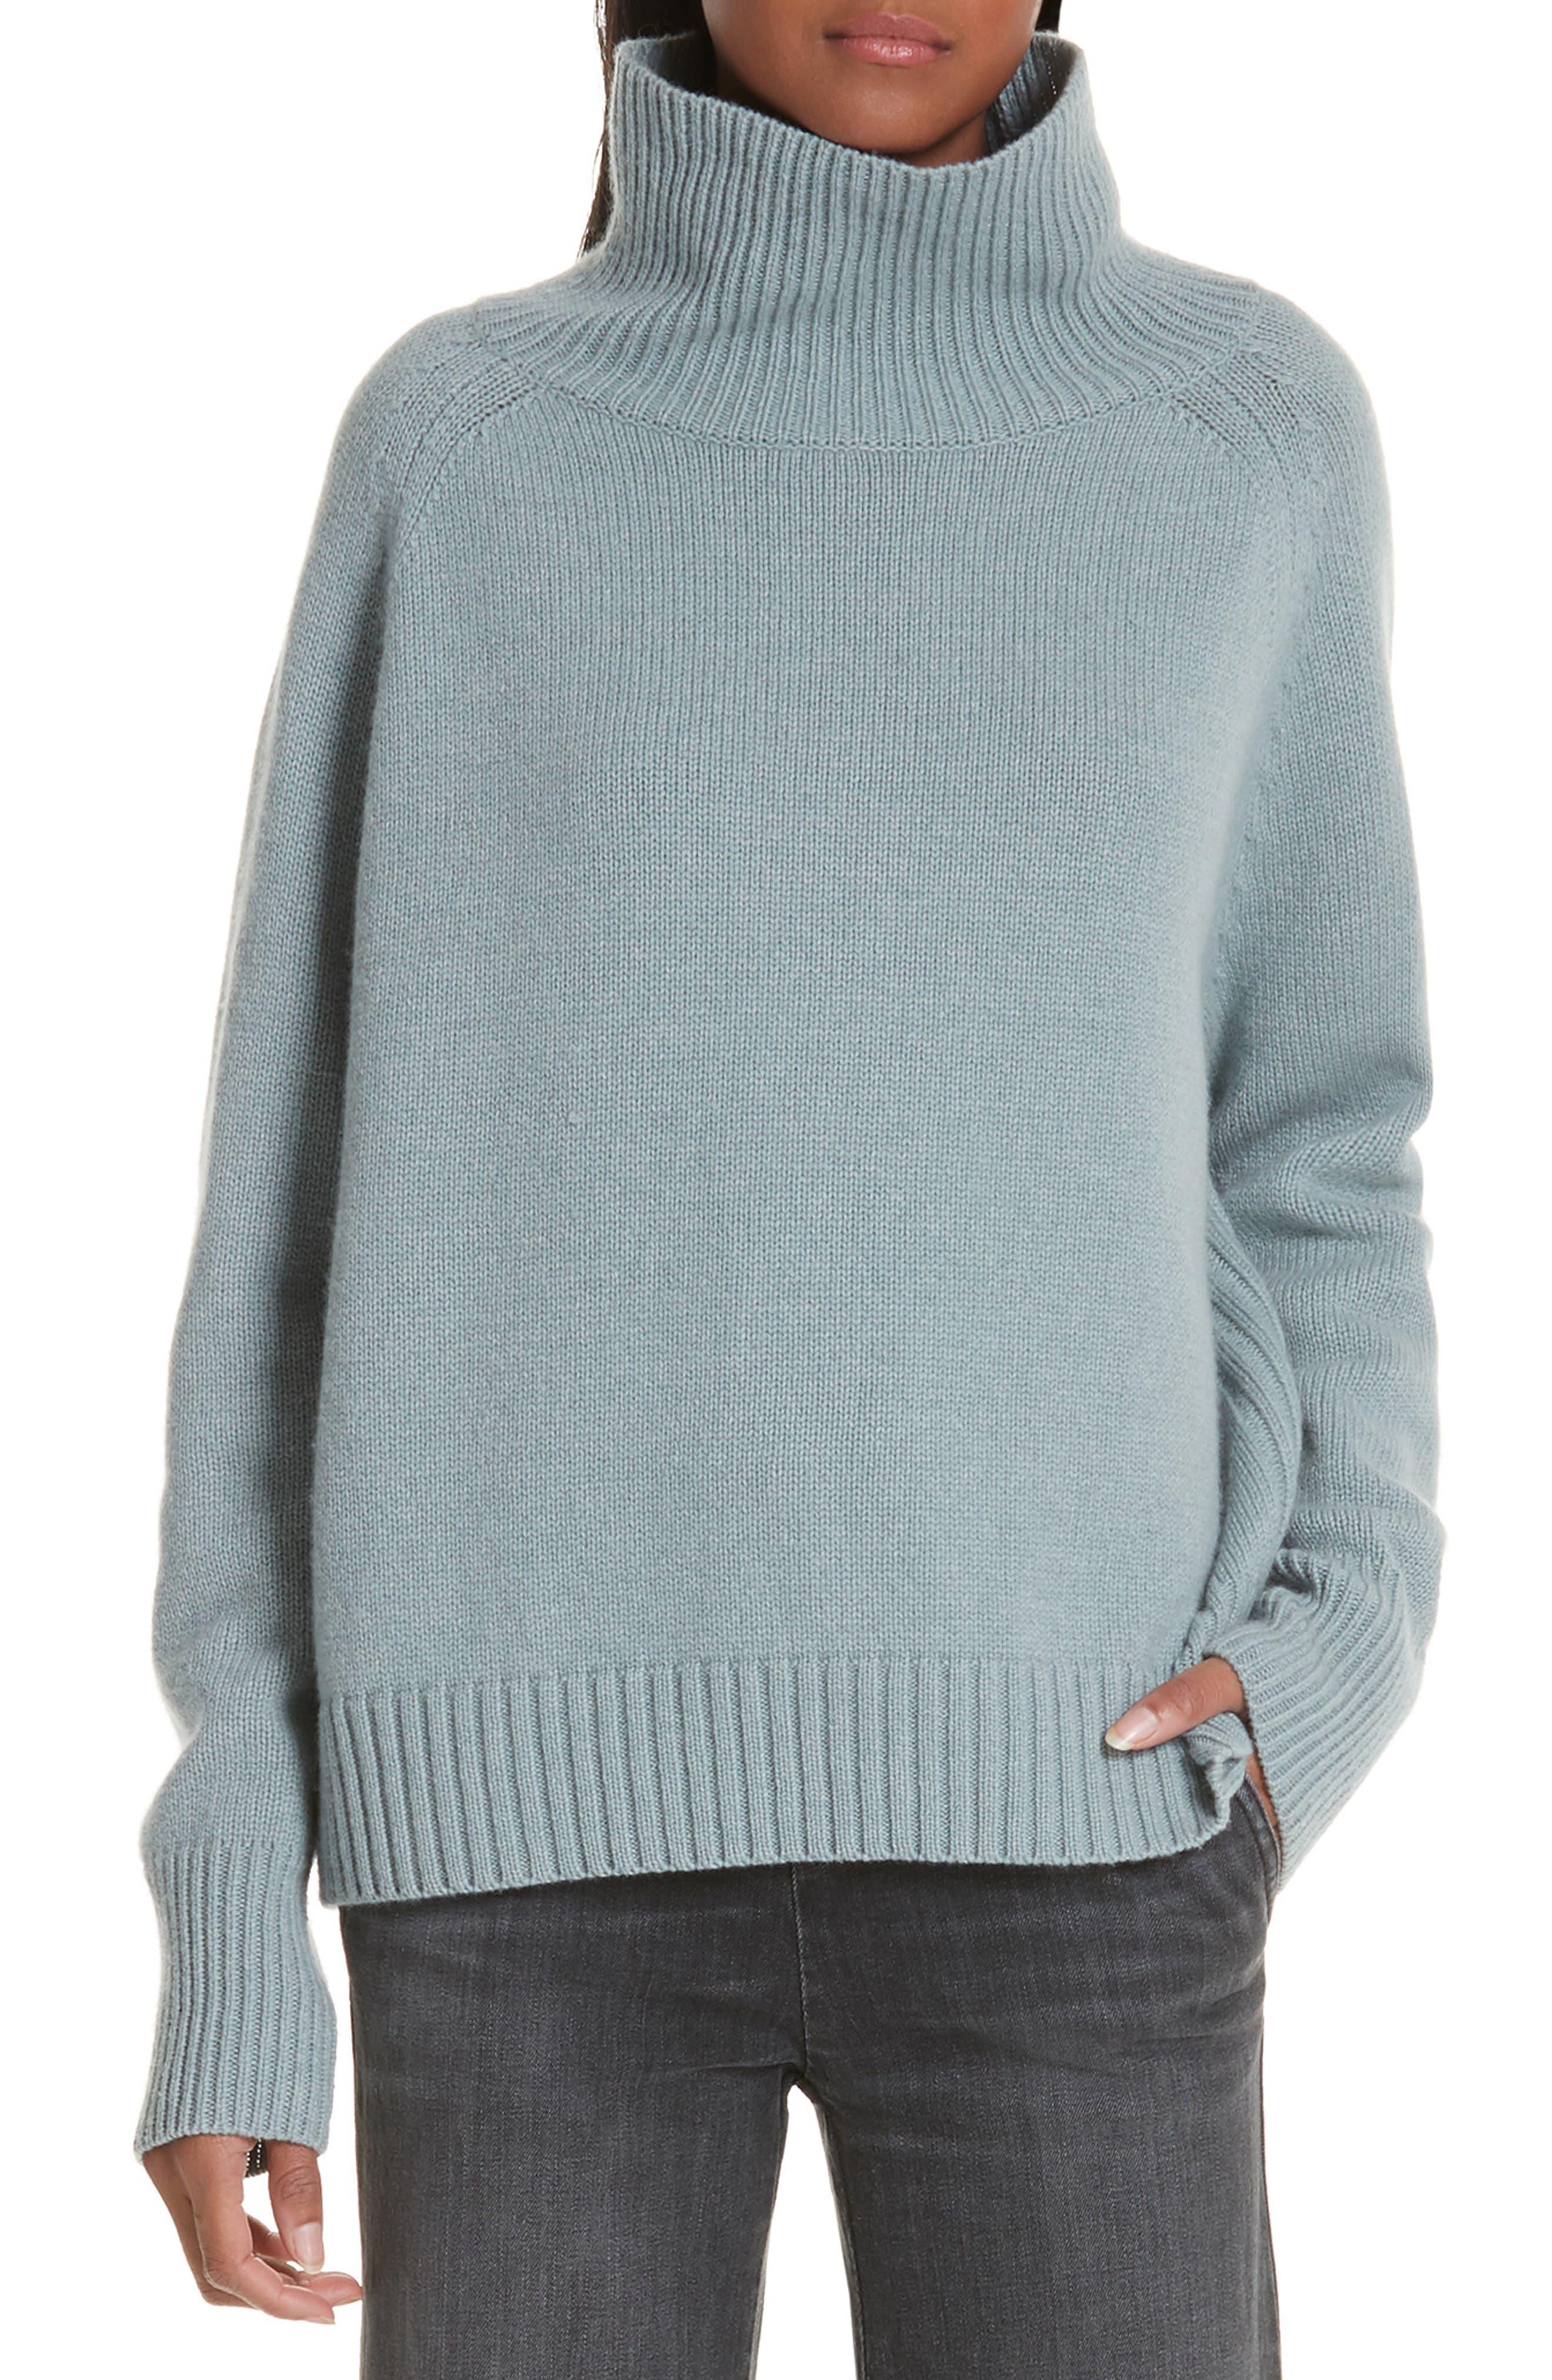 NILI LOTAN, Mariah Funnel Neck Cashmere Sweater, Main thumbnail 1, color, SKY BLUE